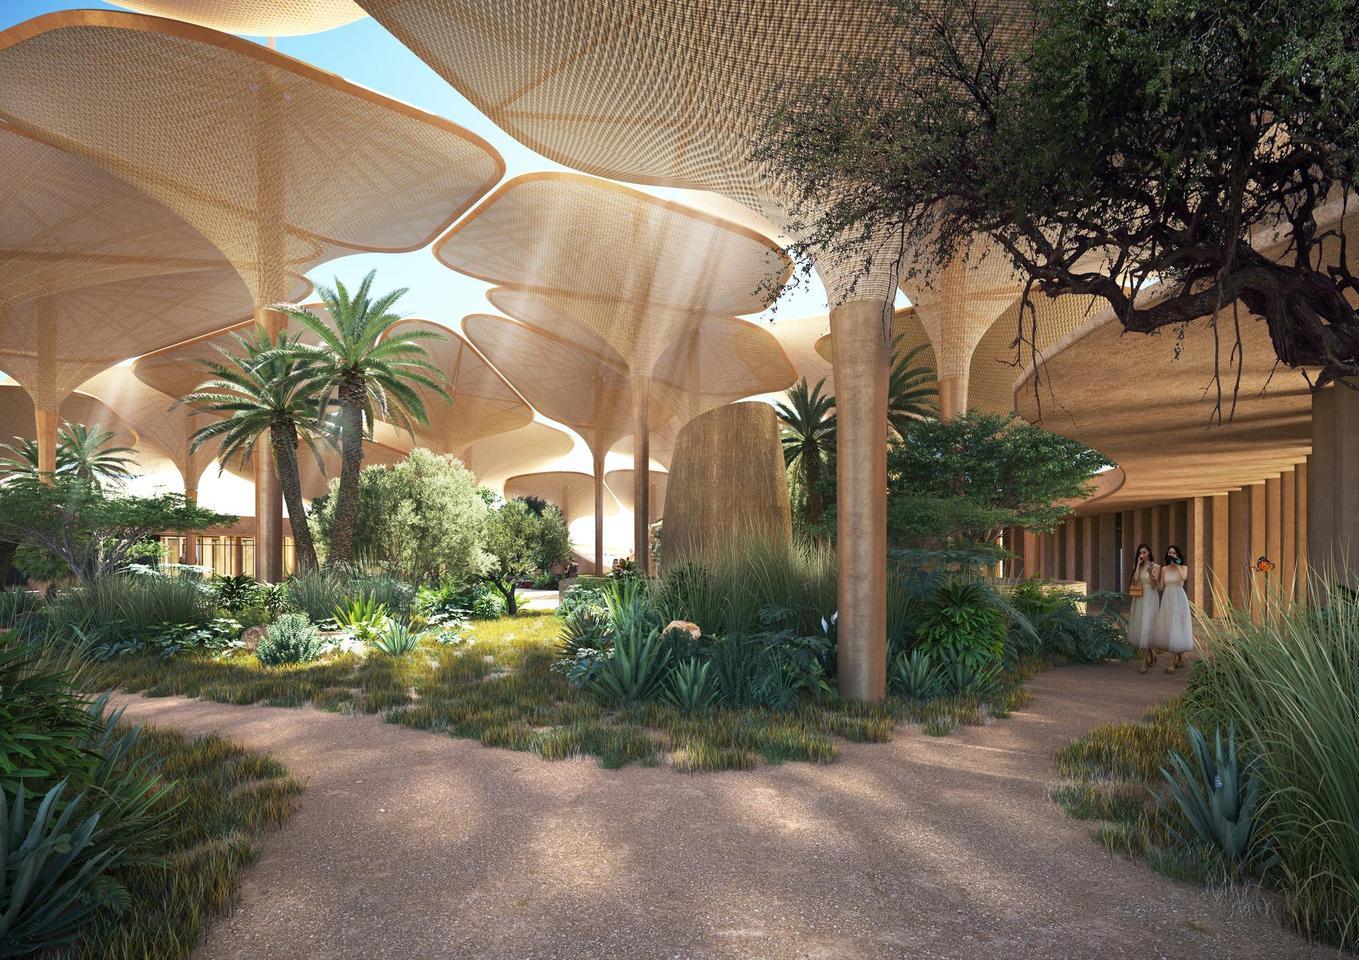 Southern Dunes에는 타는듯한 사막의 그늘을 제공하는 큰 버섯 모양의 목재 구조물이 포함될 것입니다.